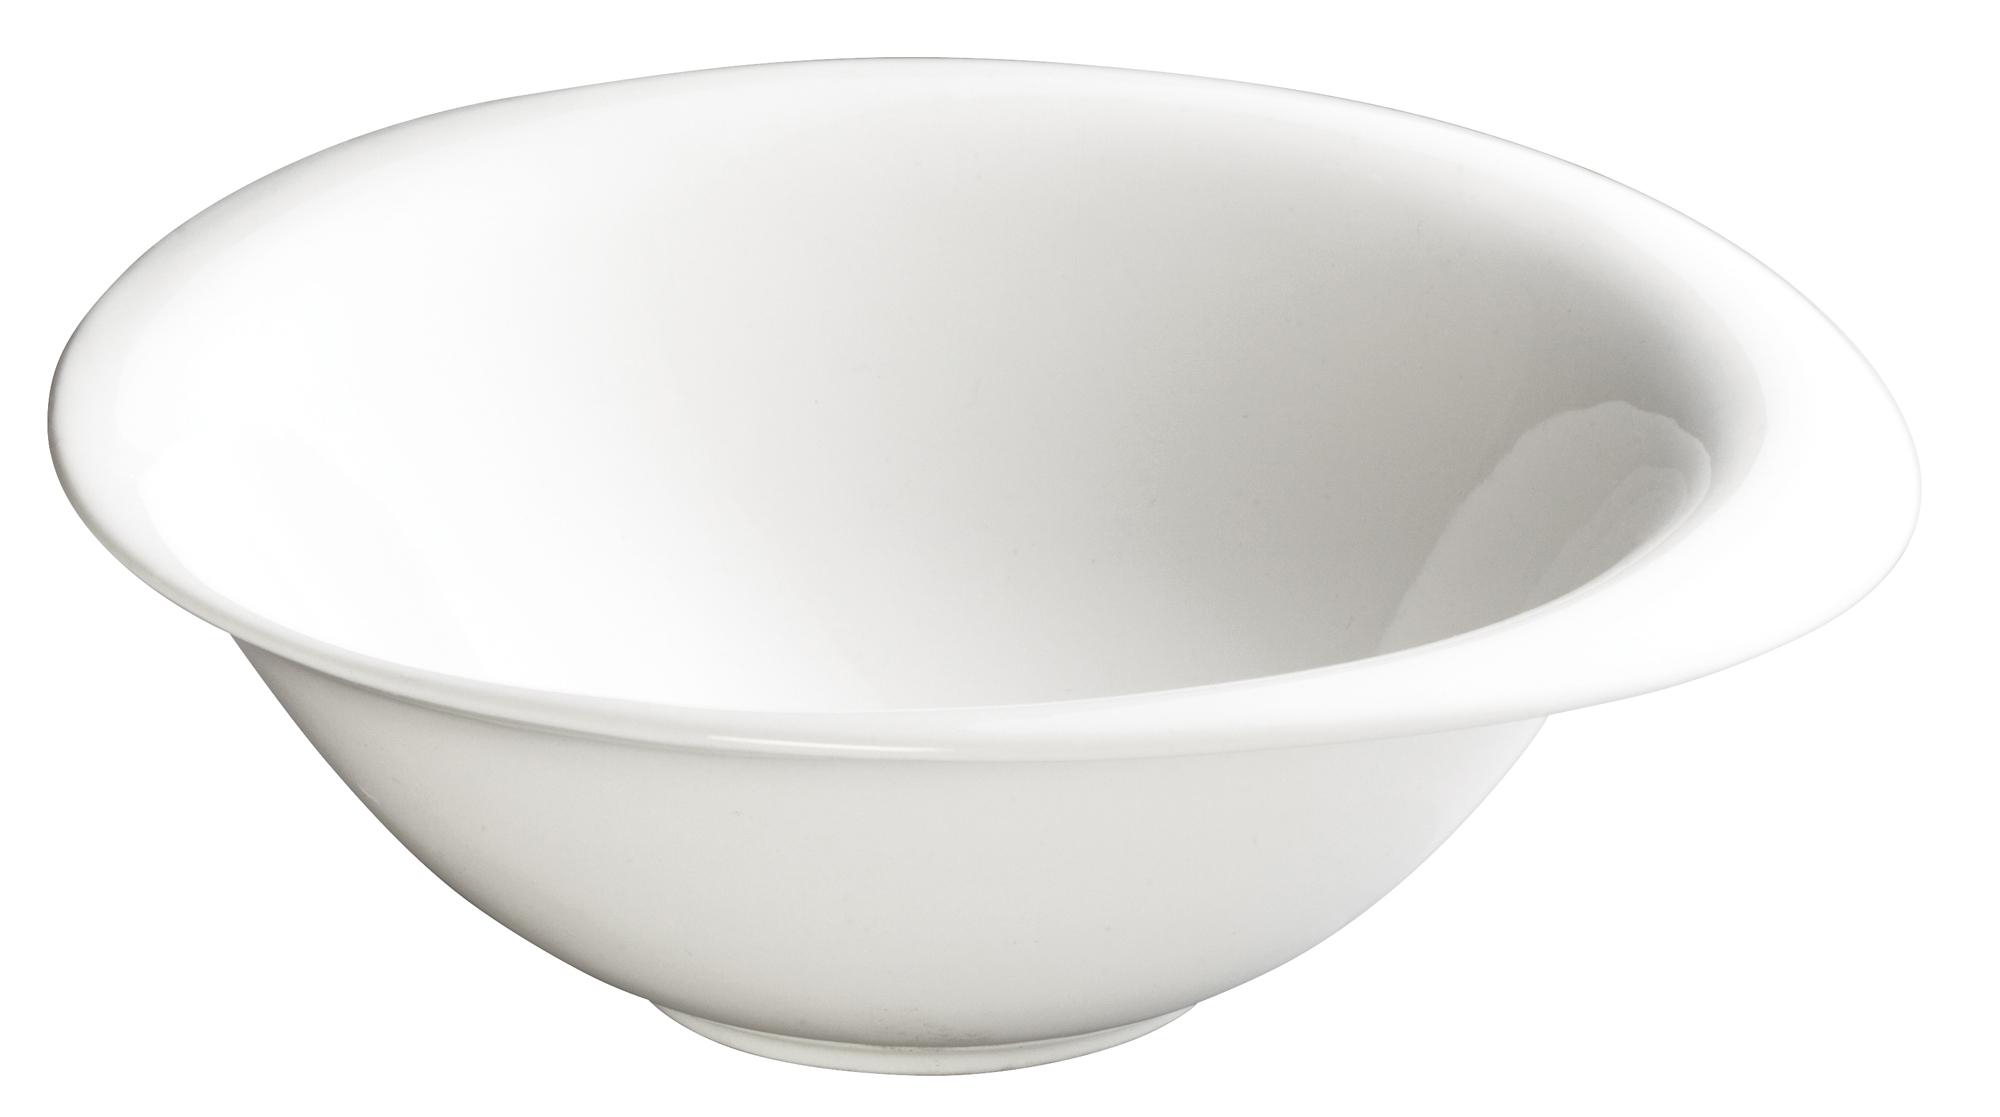 Winco WDP004-207 china, bowl, 17 - 32 oz